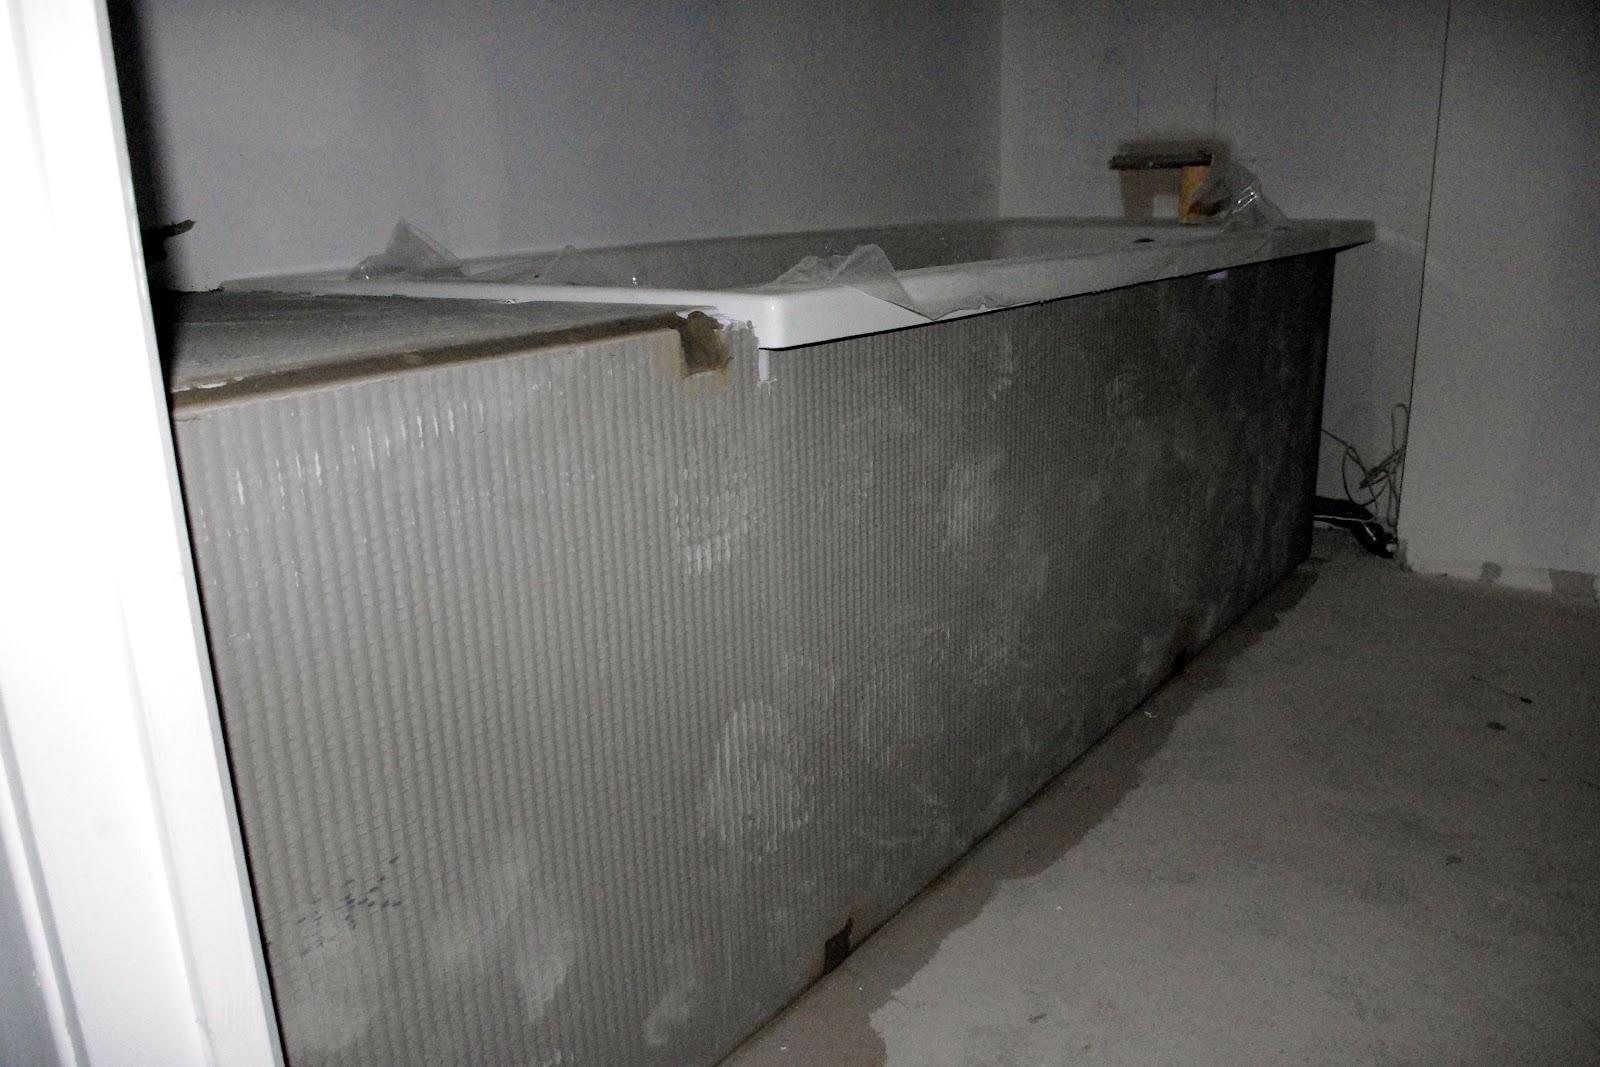 coffrage de la baignoire projet n 19. Black Bedroom Furniture Sets. Home Design Ideas